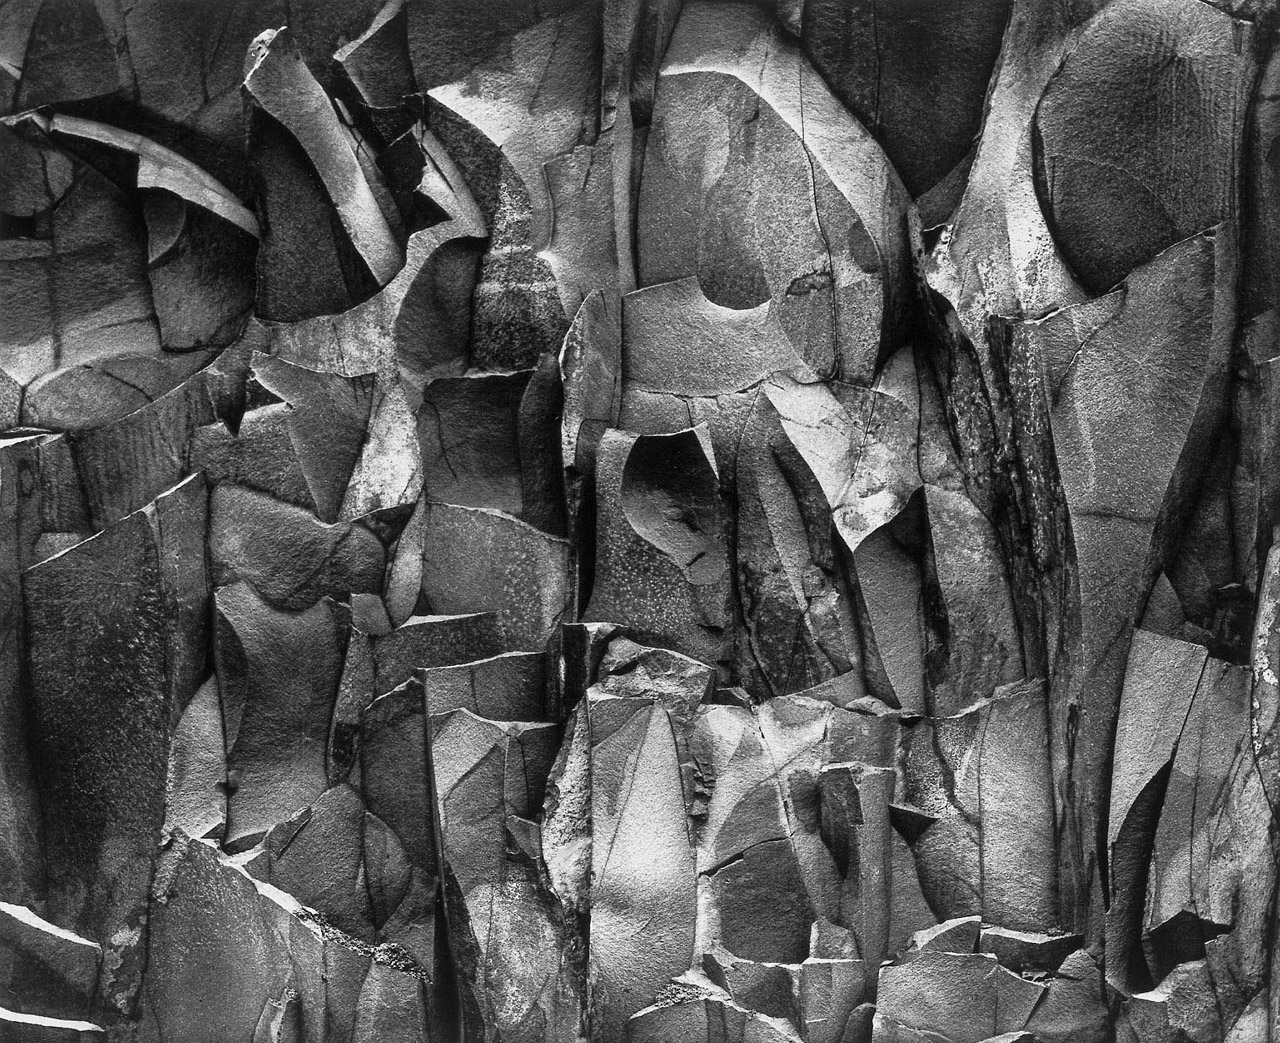 Paul Caponigro, Rock Wall No.2, West Hartford, Connecticut, 1959